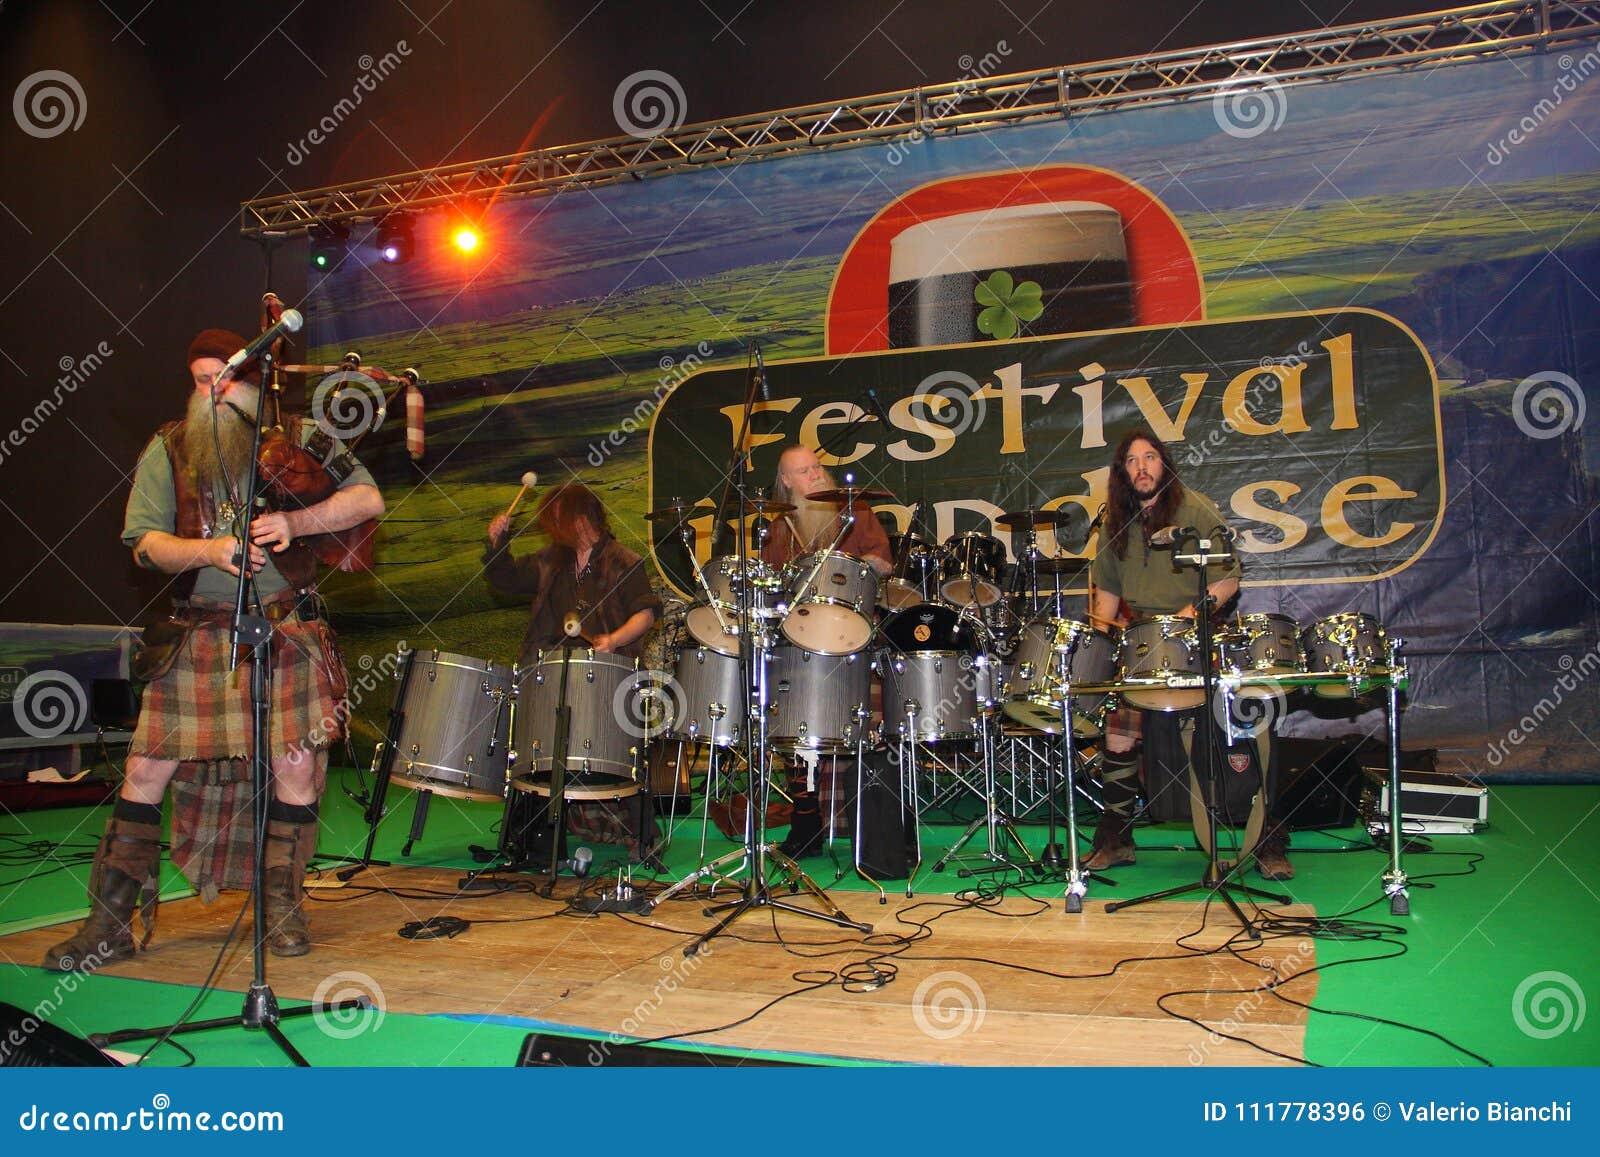 The Celtic music group Saor Patrol